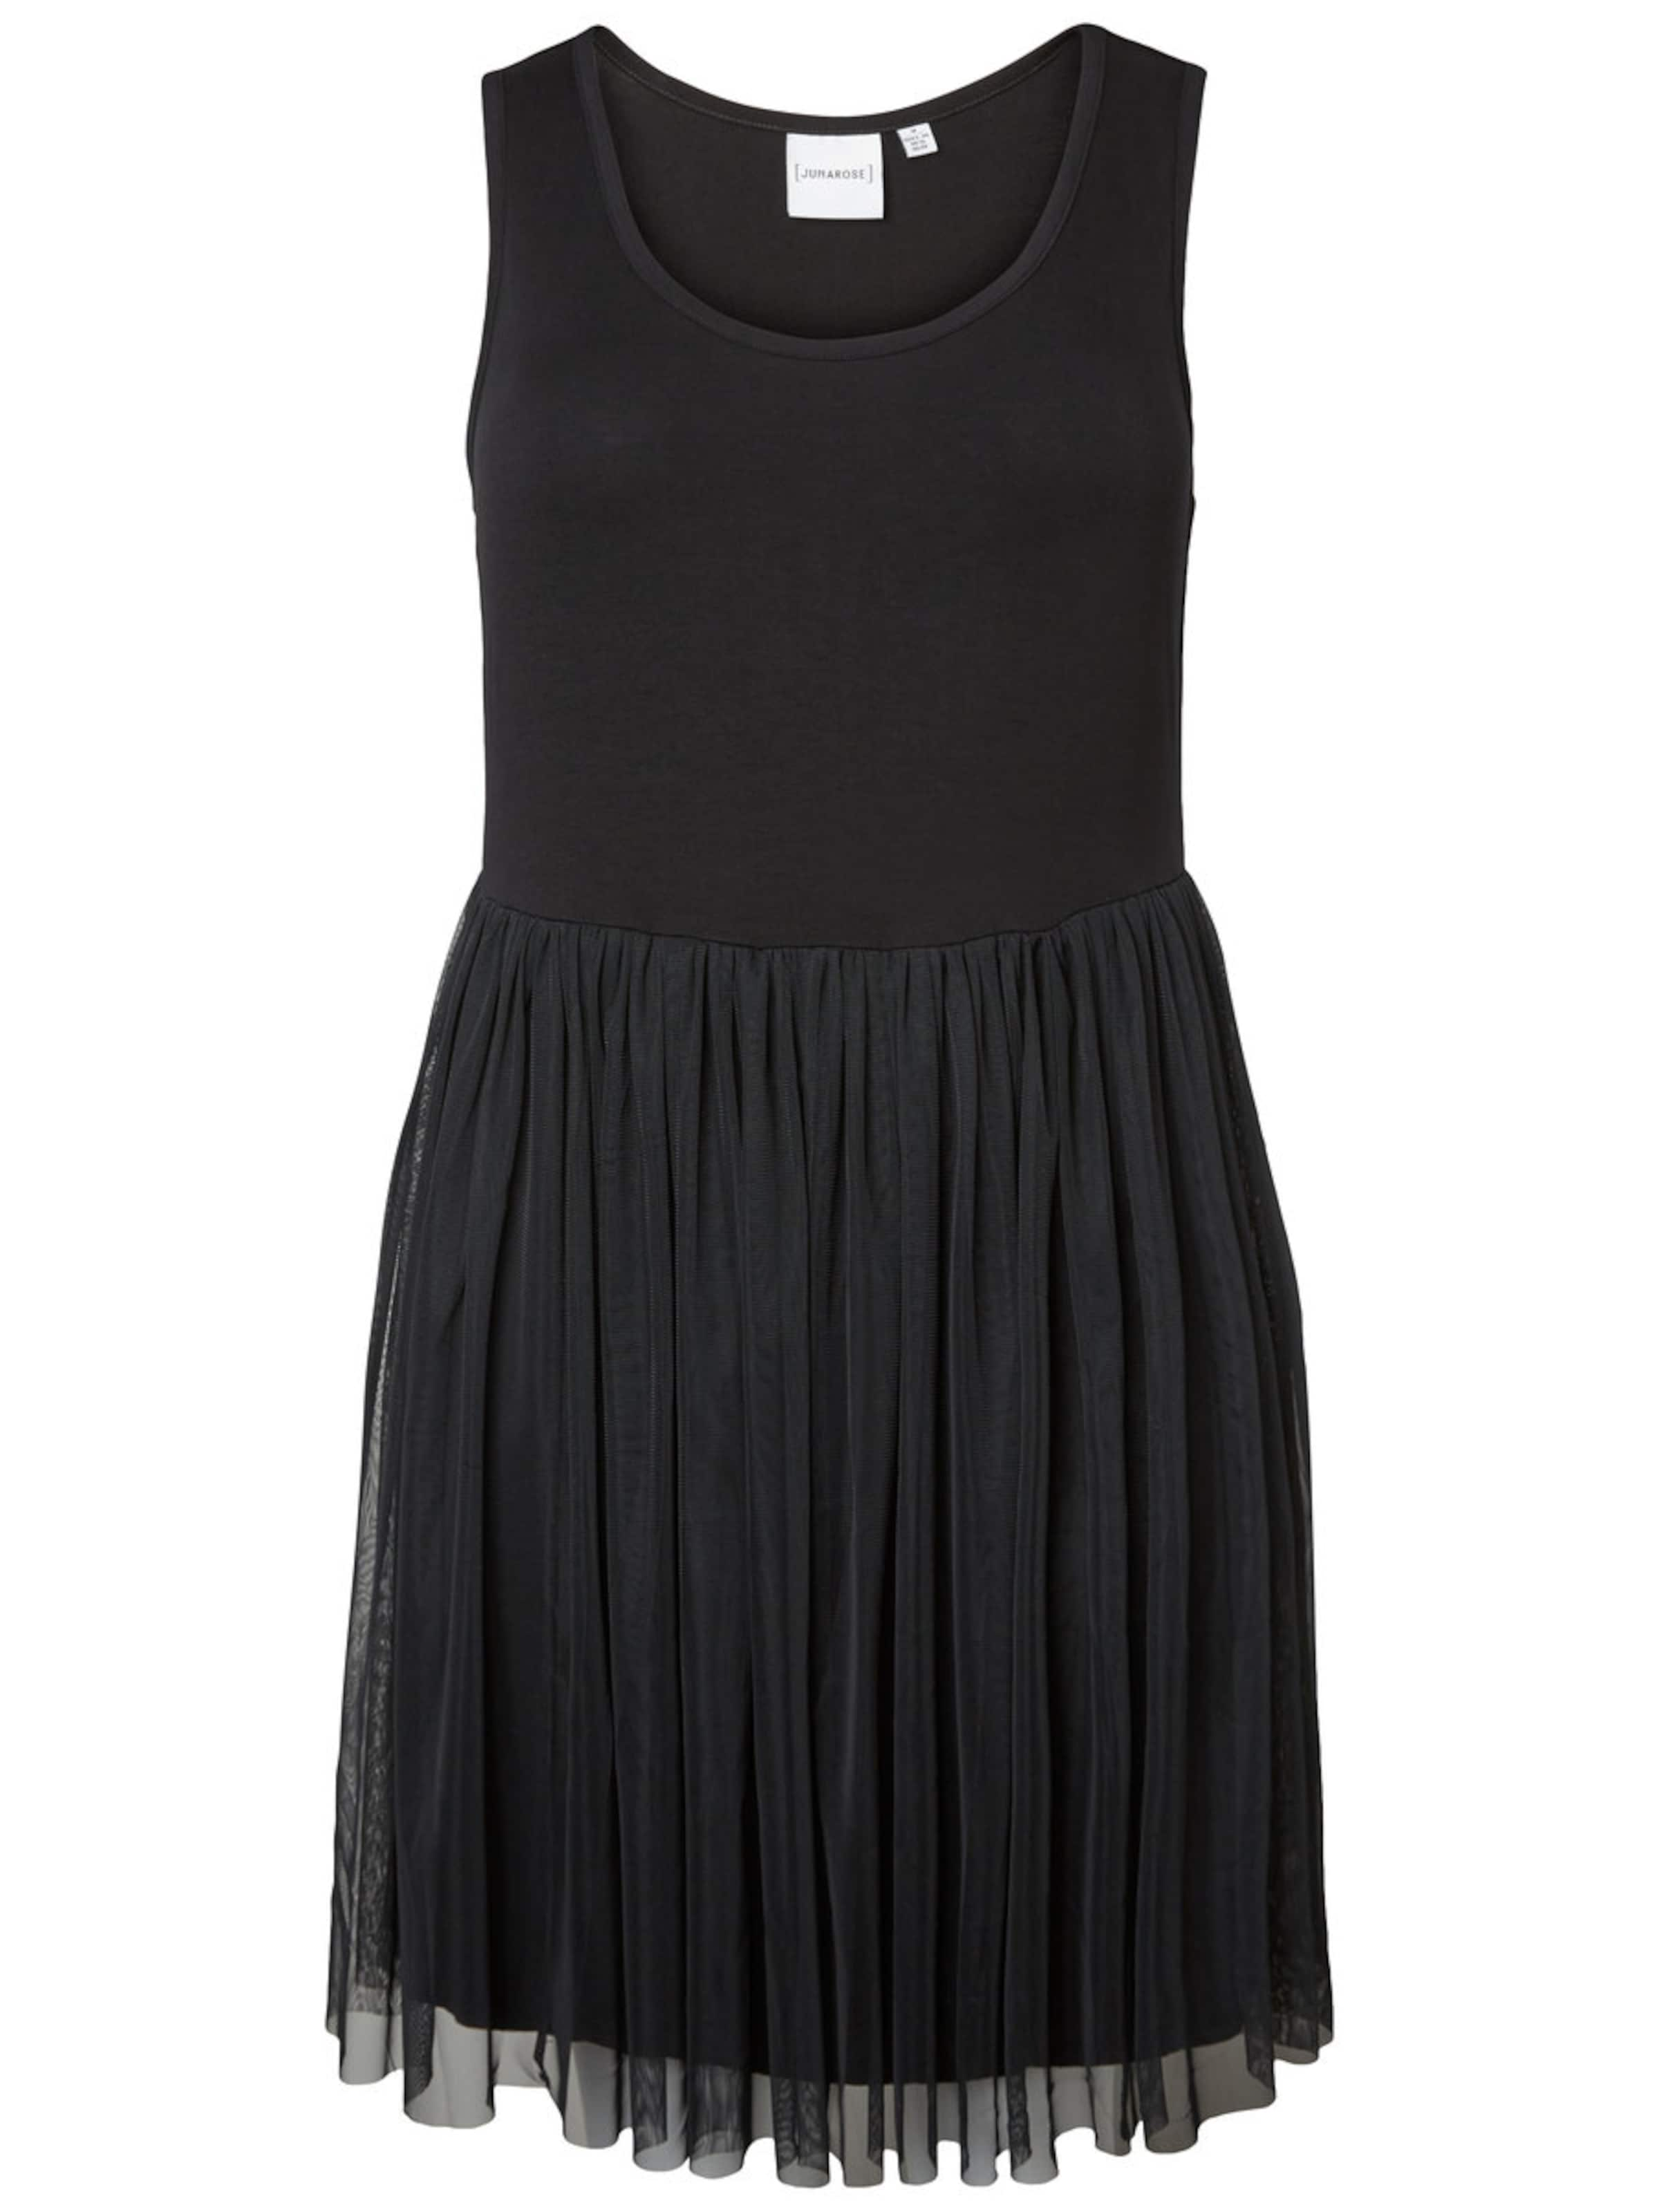 Junarose Ärmelloses Kleid Günstig Kaufen Kosten 20enxka